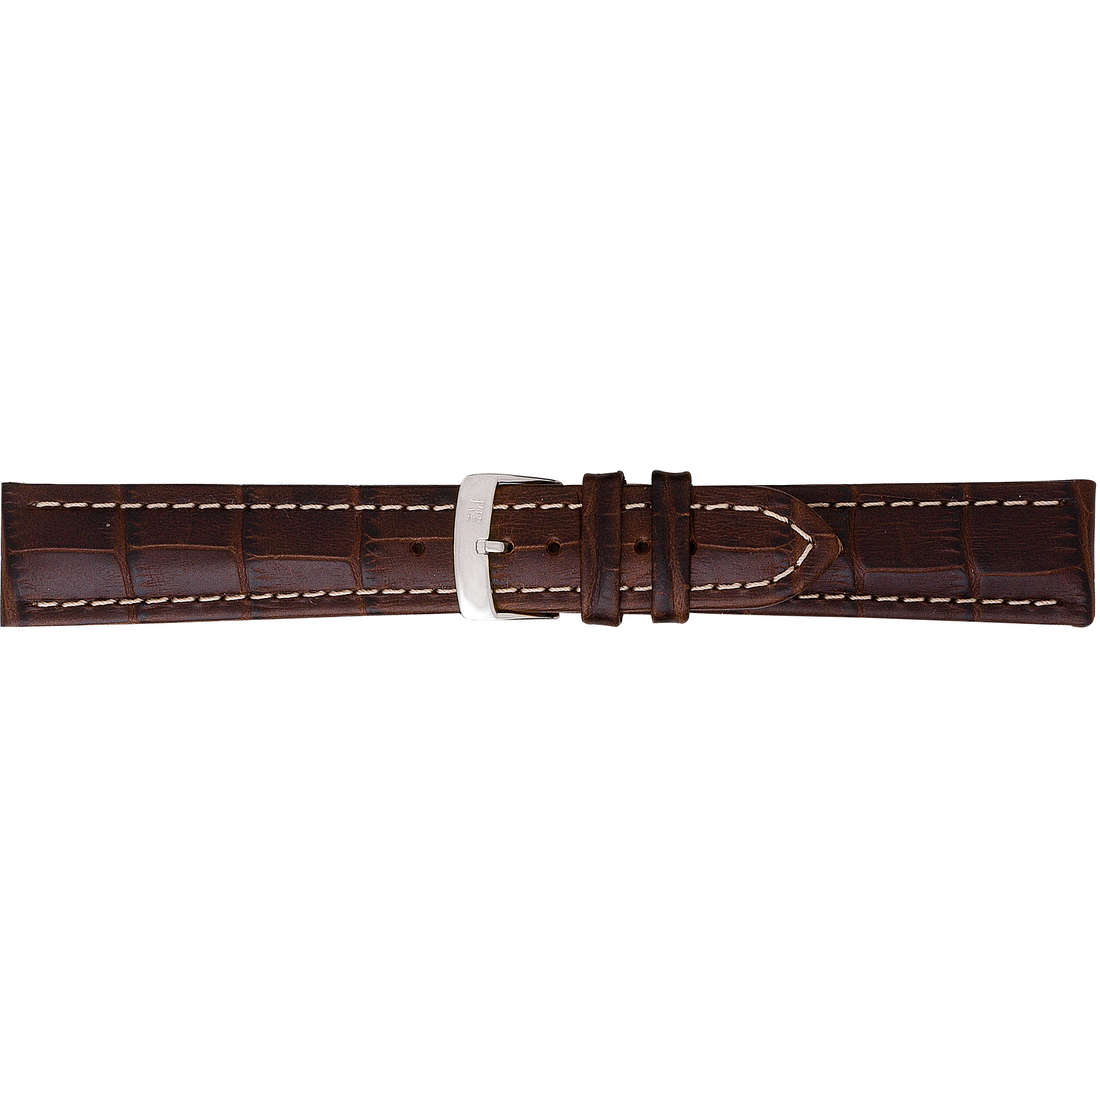 watch watch bands watch straps man Morellato Morellato 1930 A01U3252480032CR18